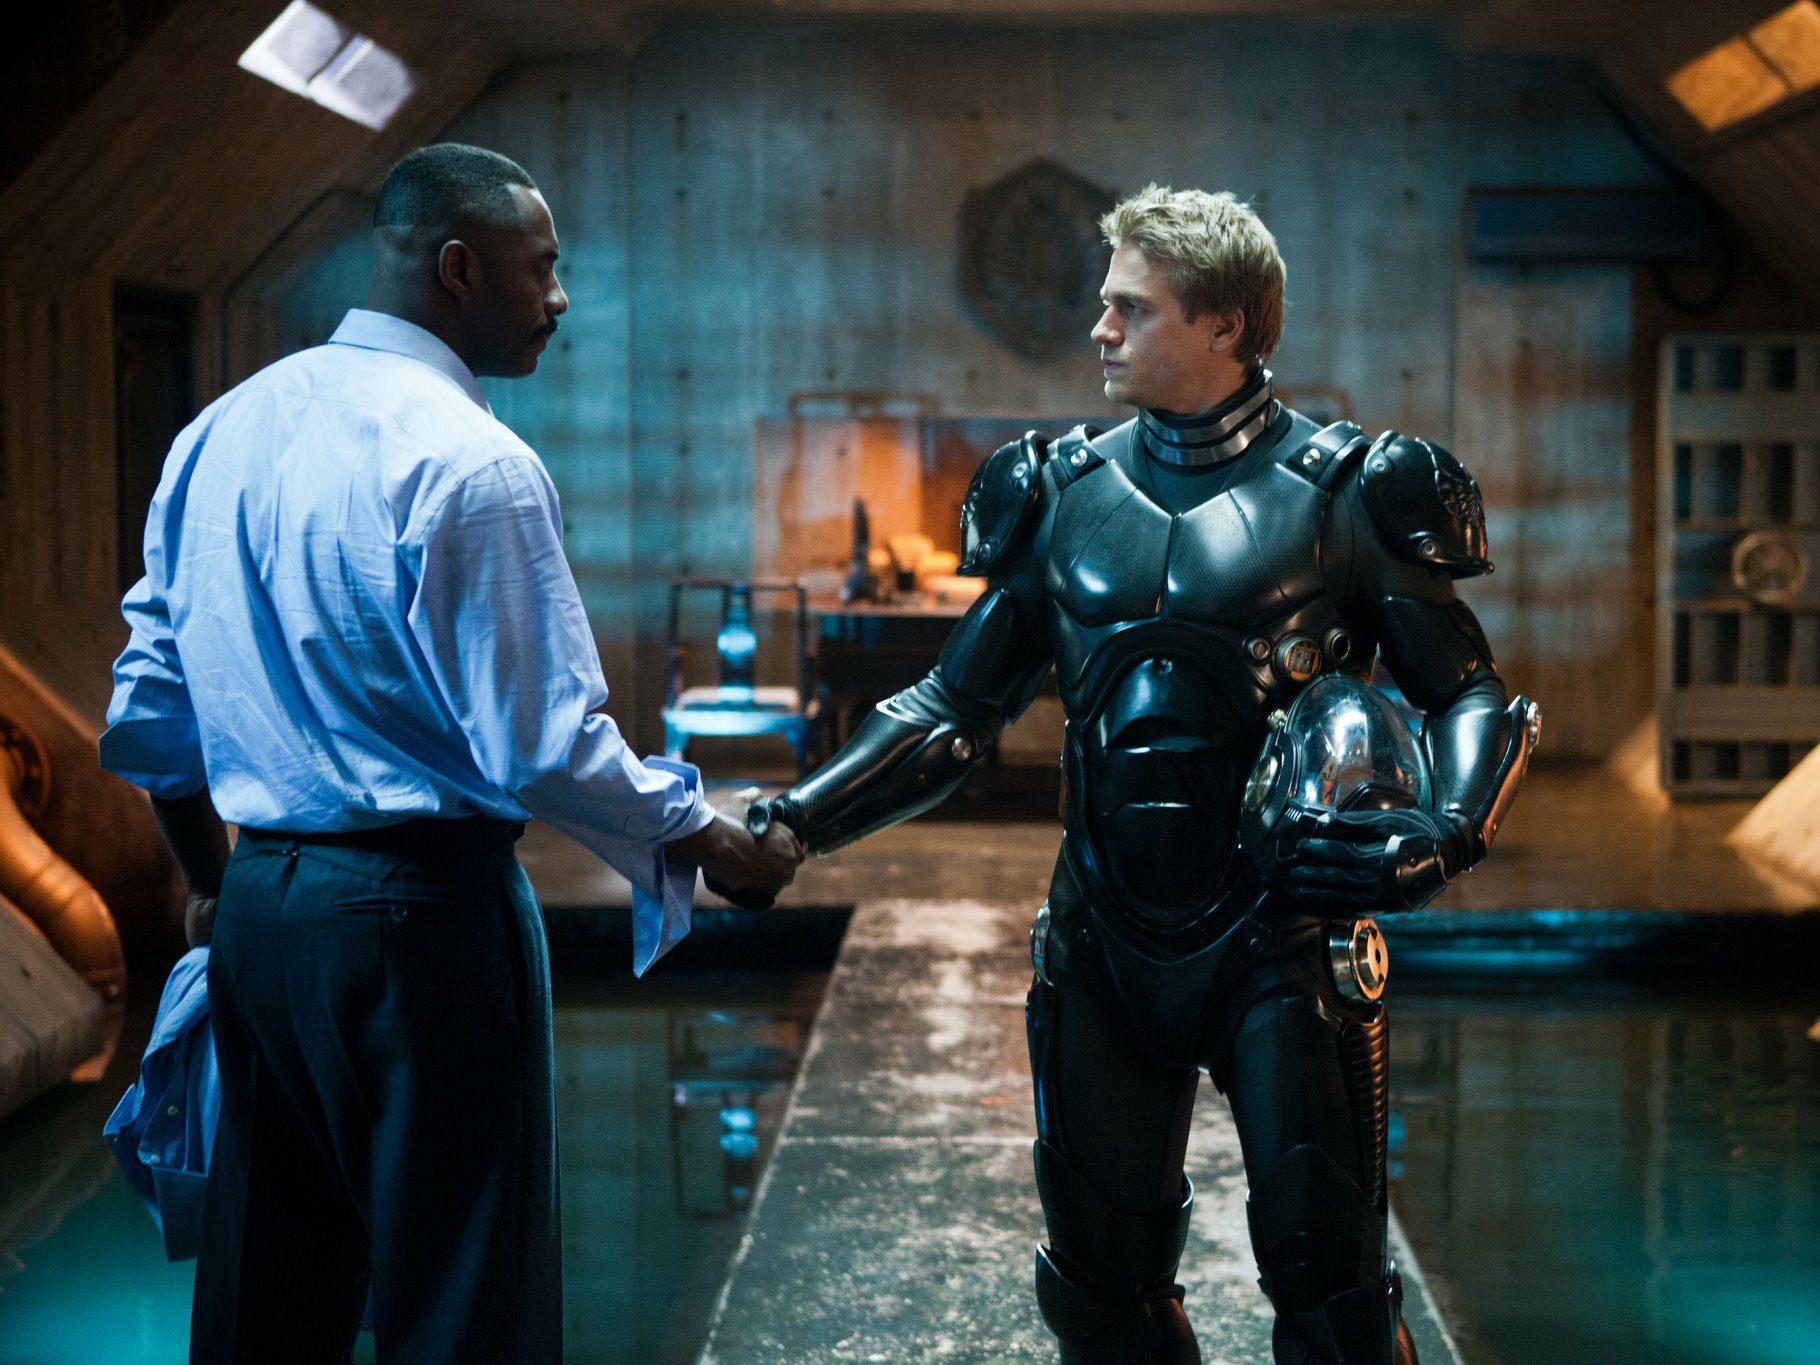 Best sci-fi movies on Netflix - Pacific Rim